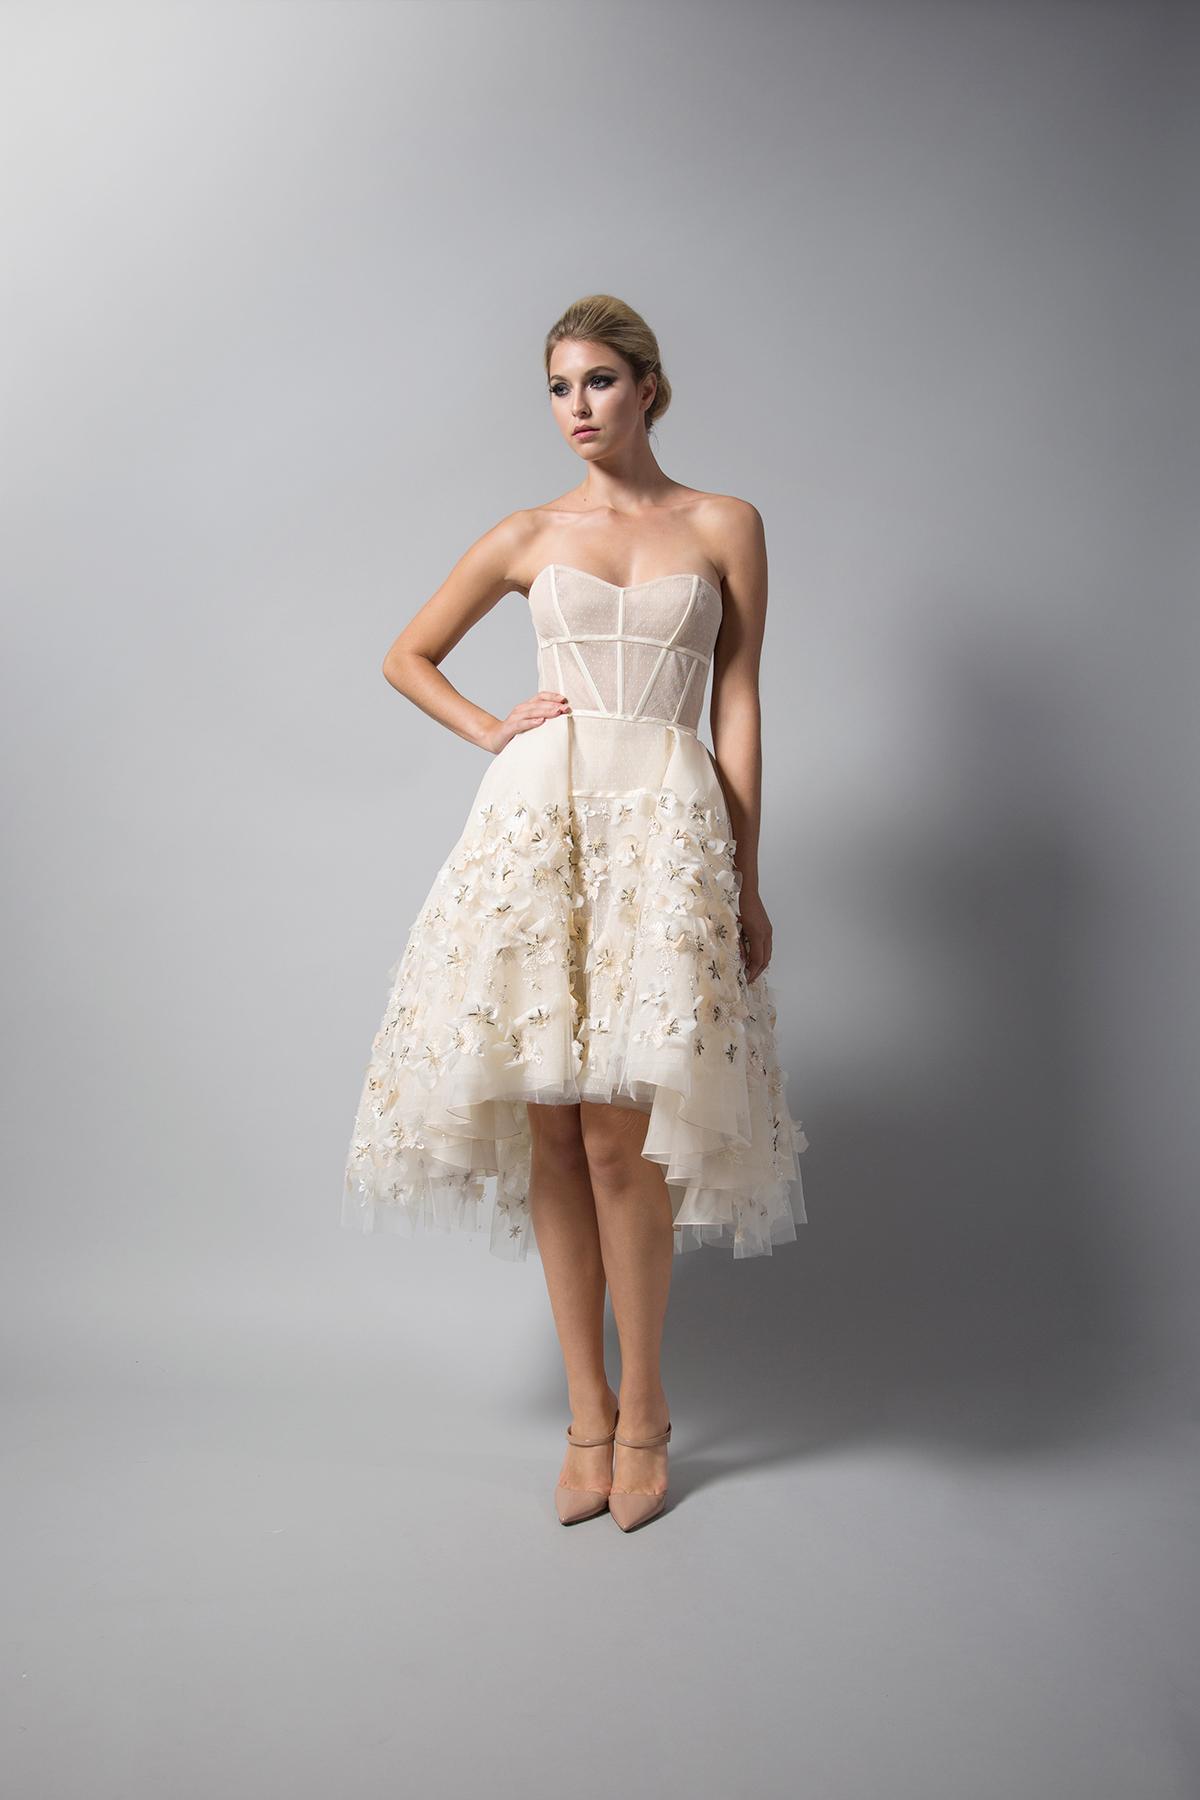 randi rahm nude short wedding dress fall 2018